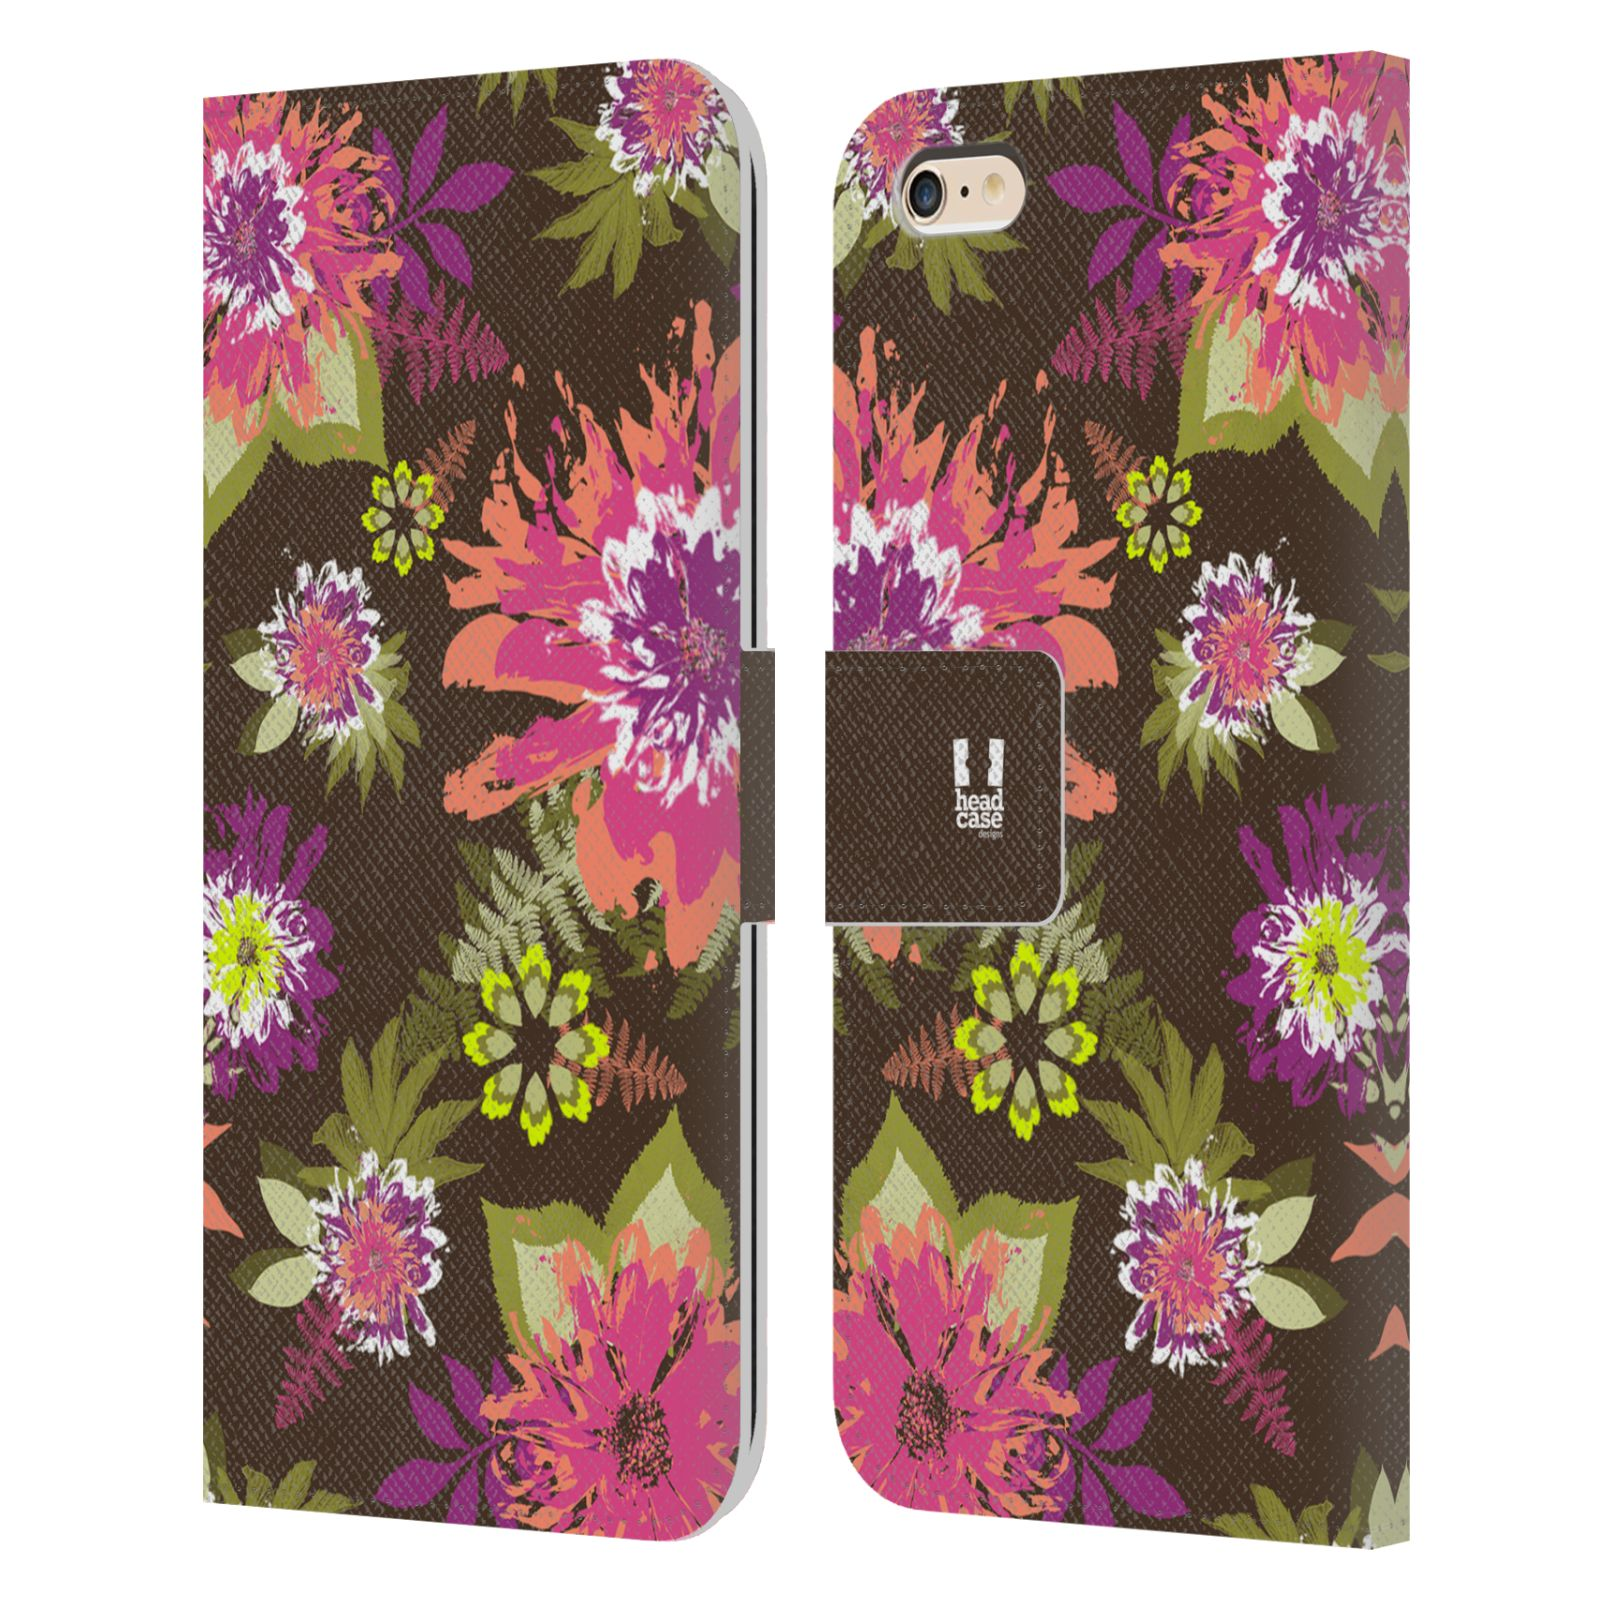 HEAD CASE Flipové pouzdro pro mobil Apple Iphone 6 PLUS / 6S PLUS BOTANIKA barevné květy zelená